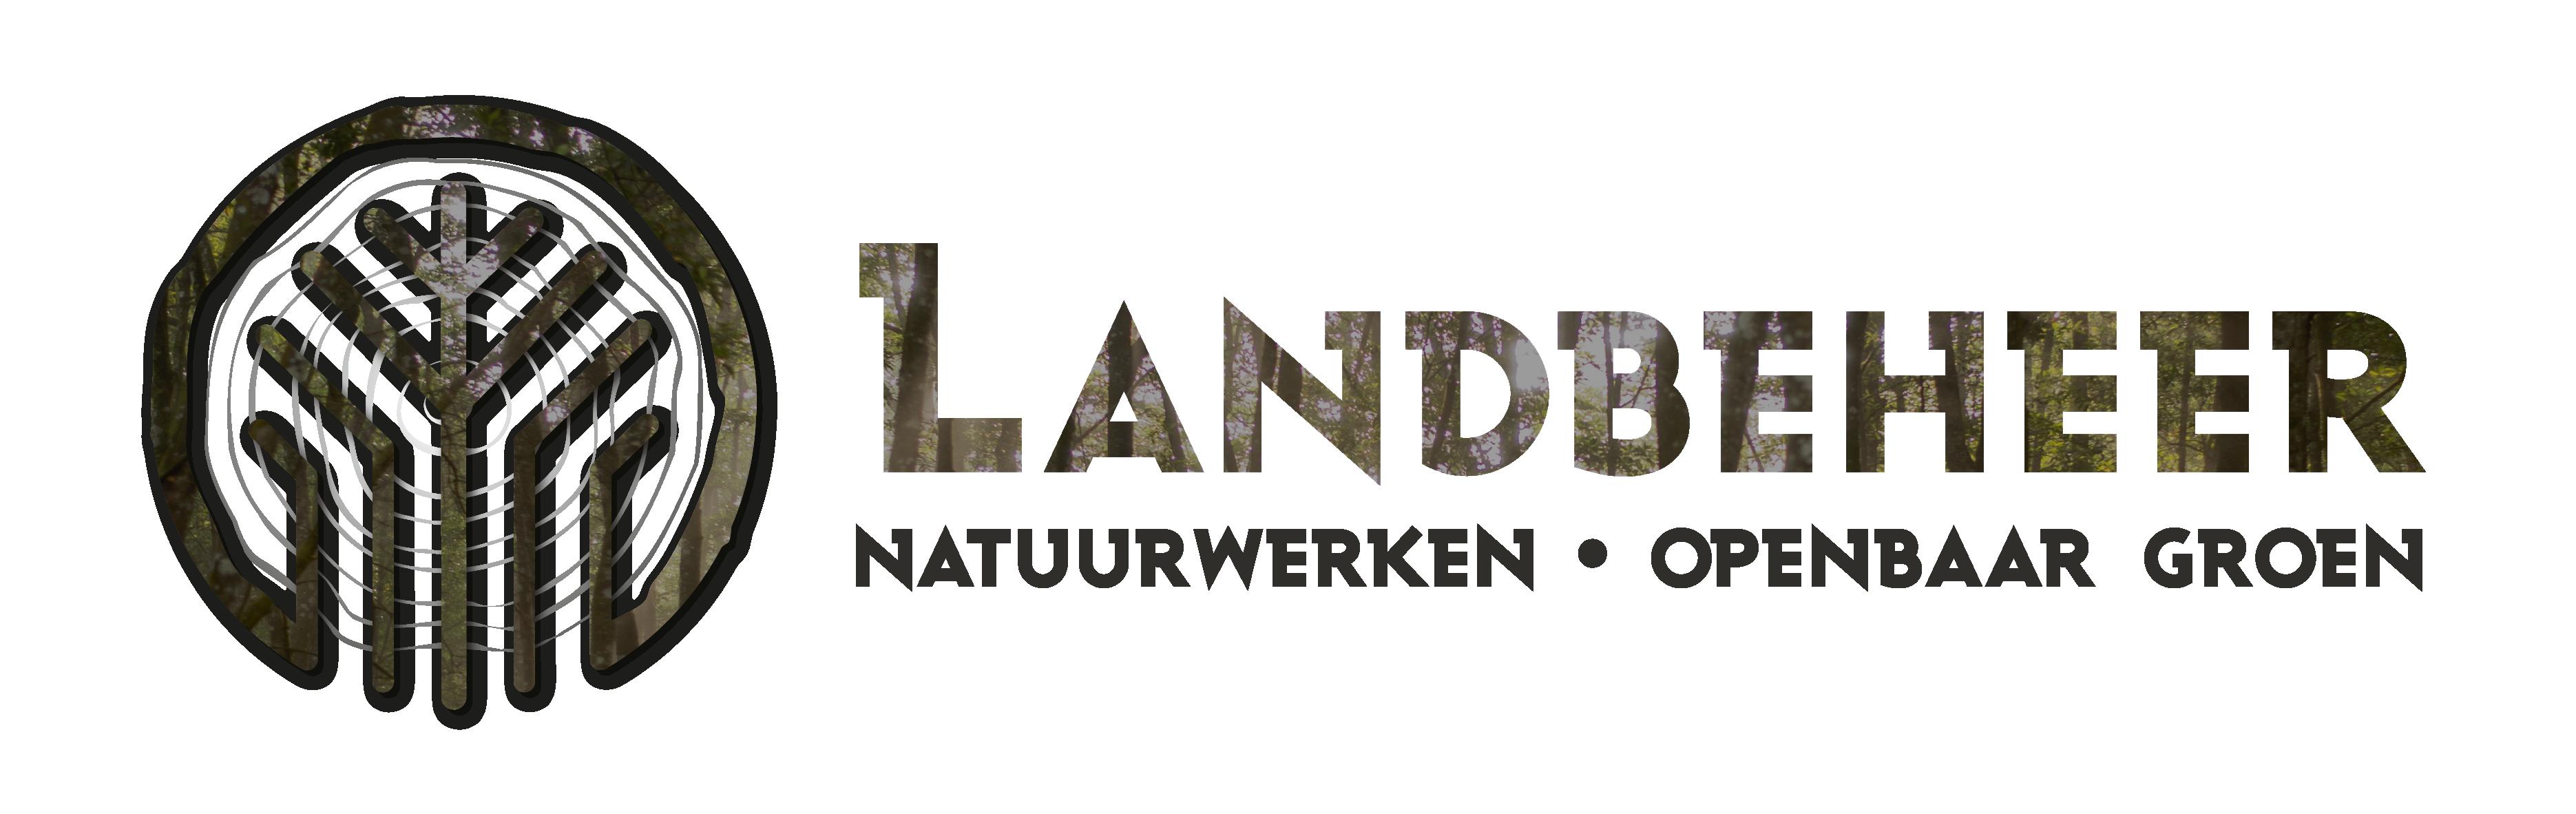 Logo Landbeheer bv